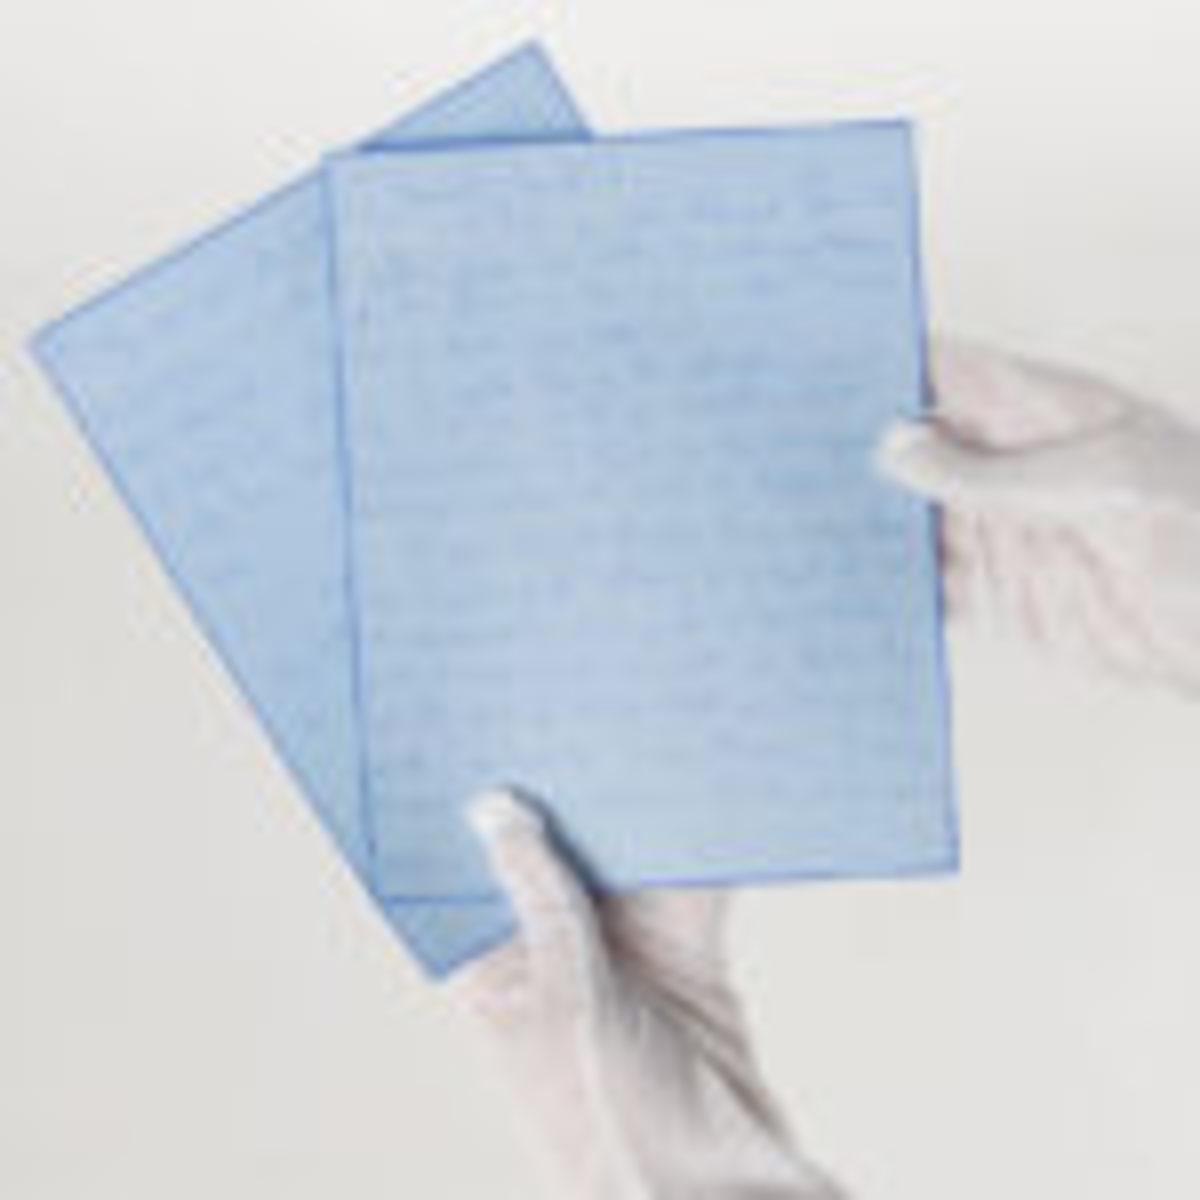 jacqueline kennedy love letter